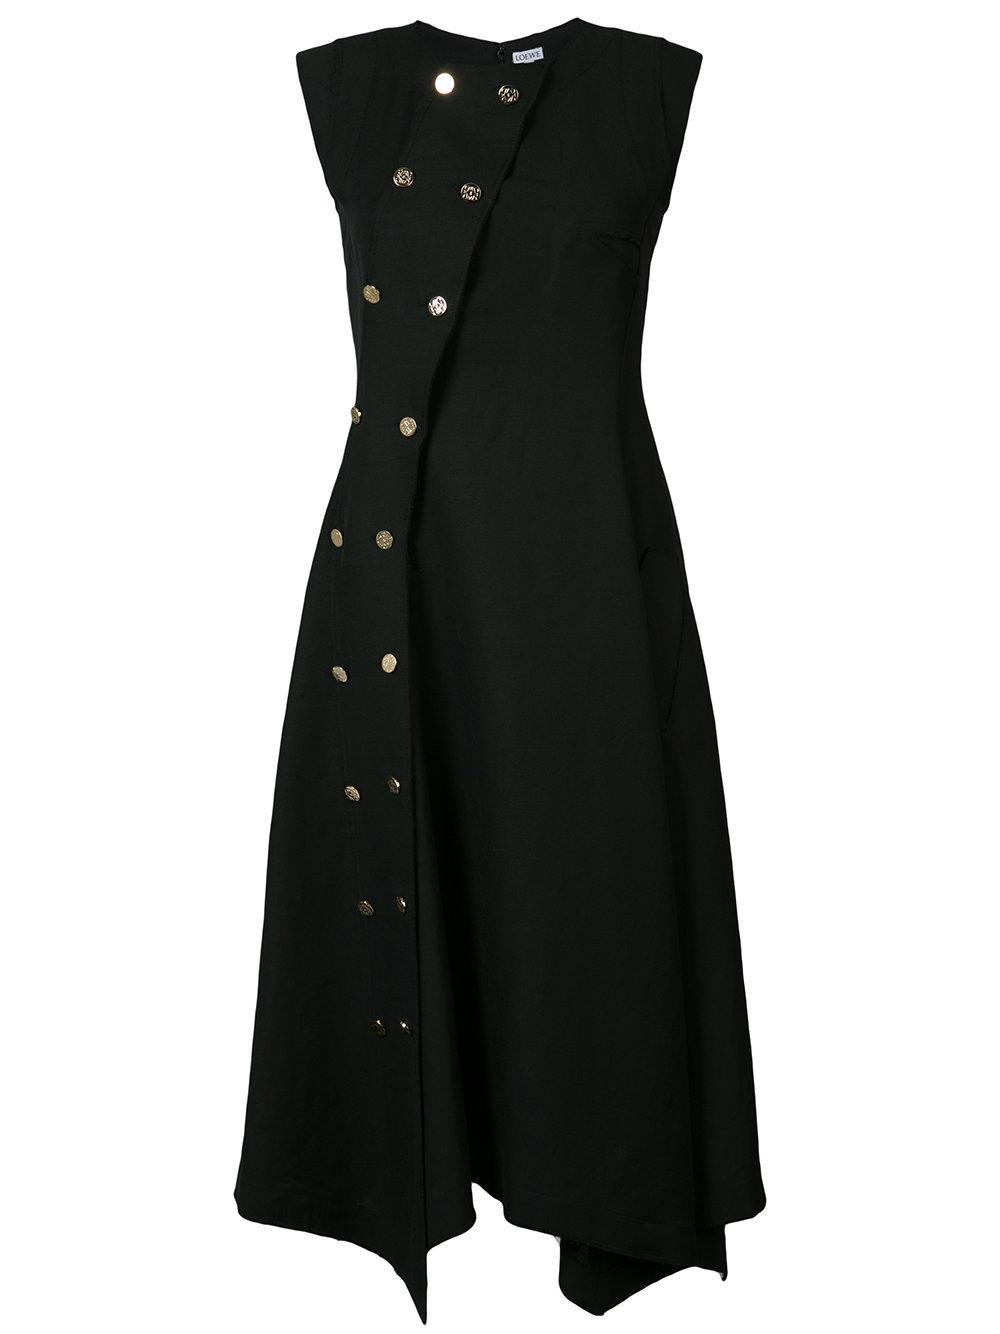 Lyst Loewe Double Breasted Dress In Black